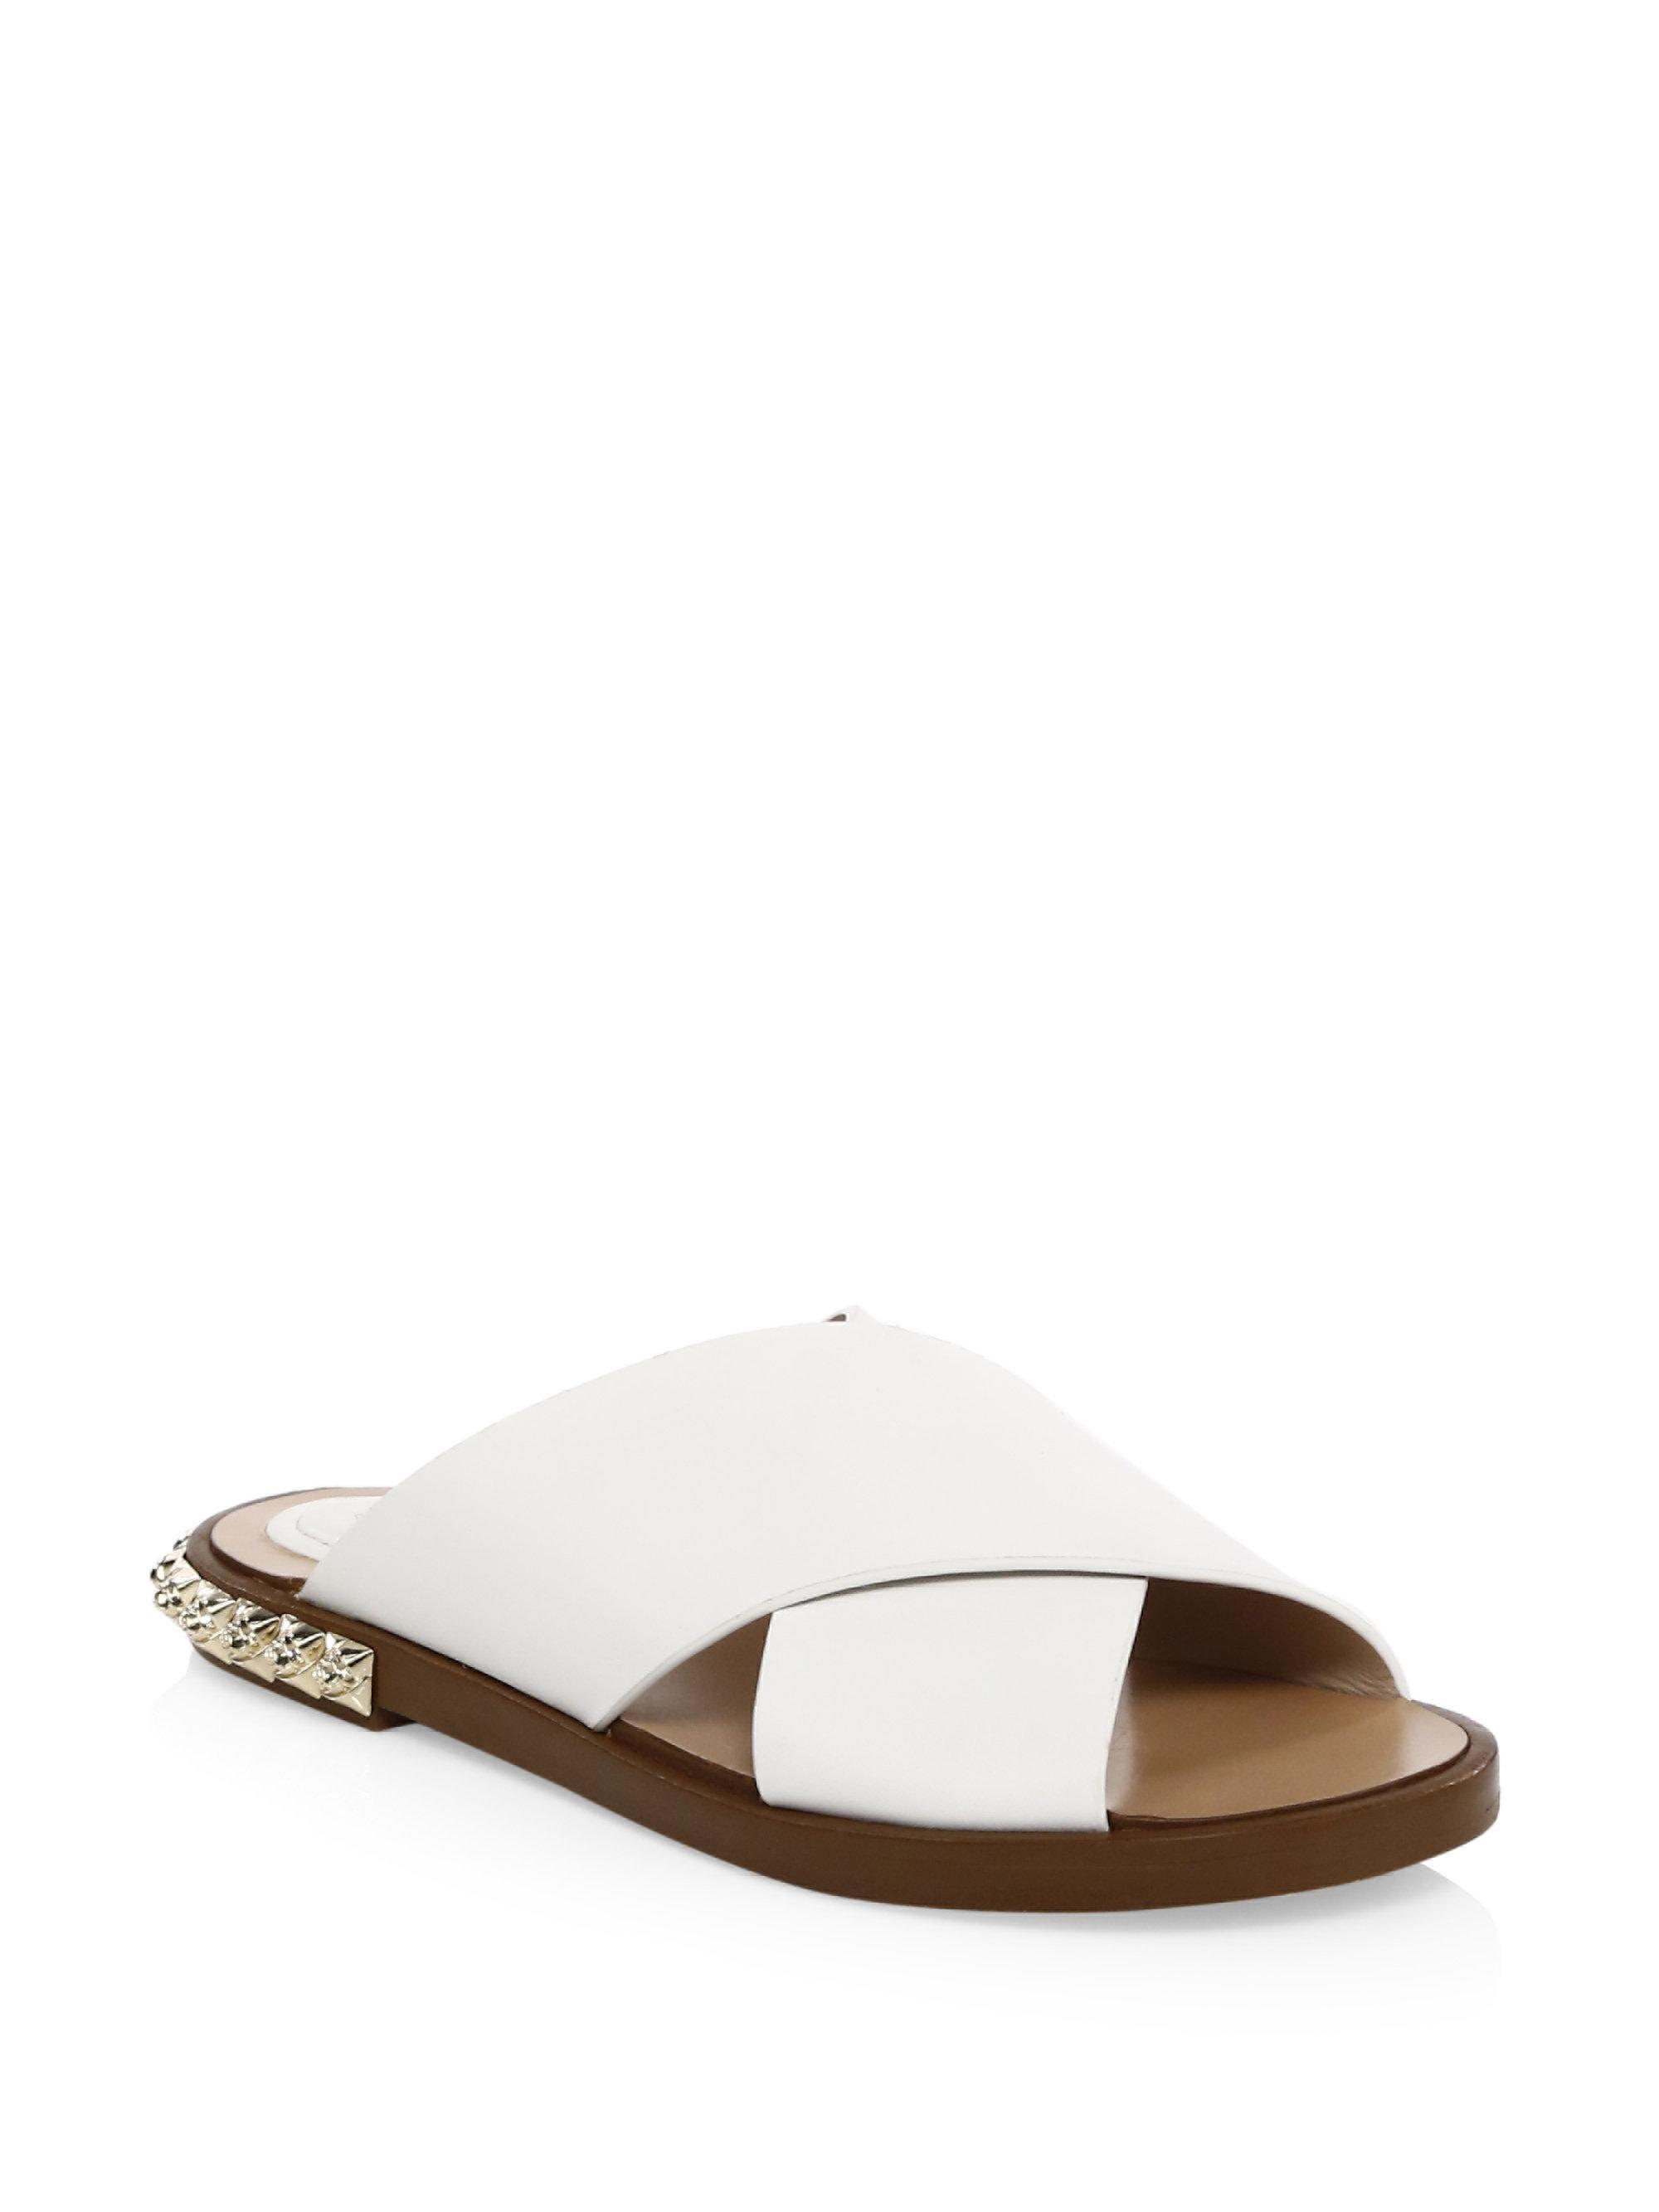 Stuart Weitzman Land Decor Leather Slides uECu0lu